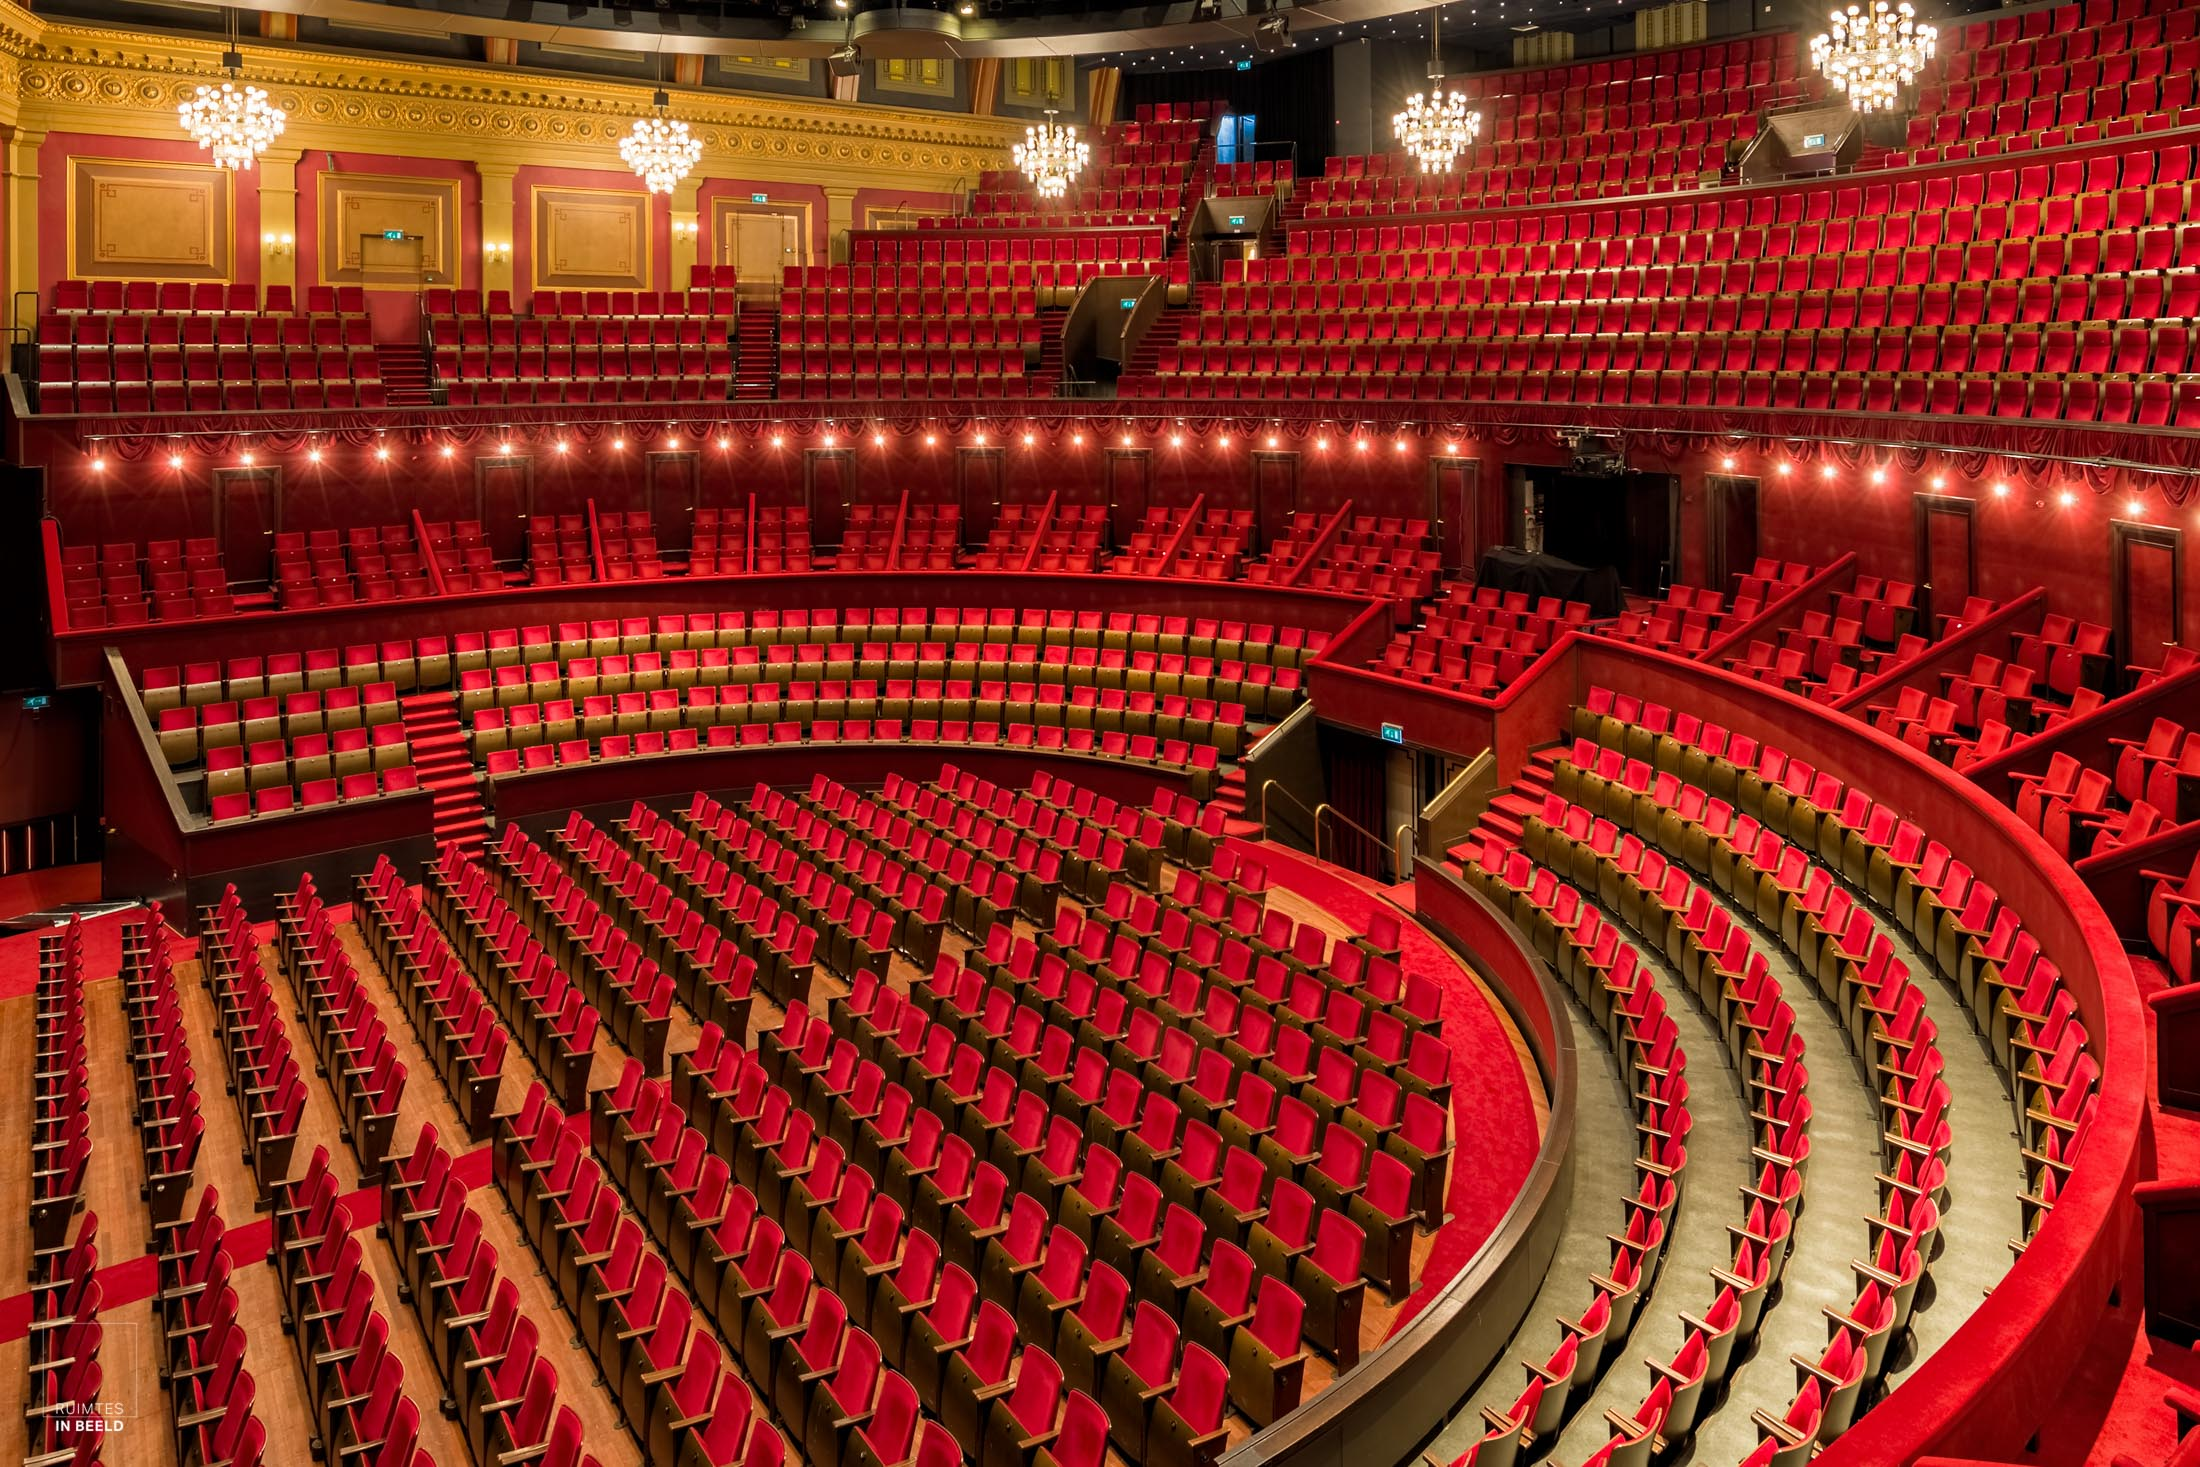 Theater-Carre-Amsterdam-7-2.jpg